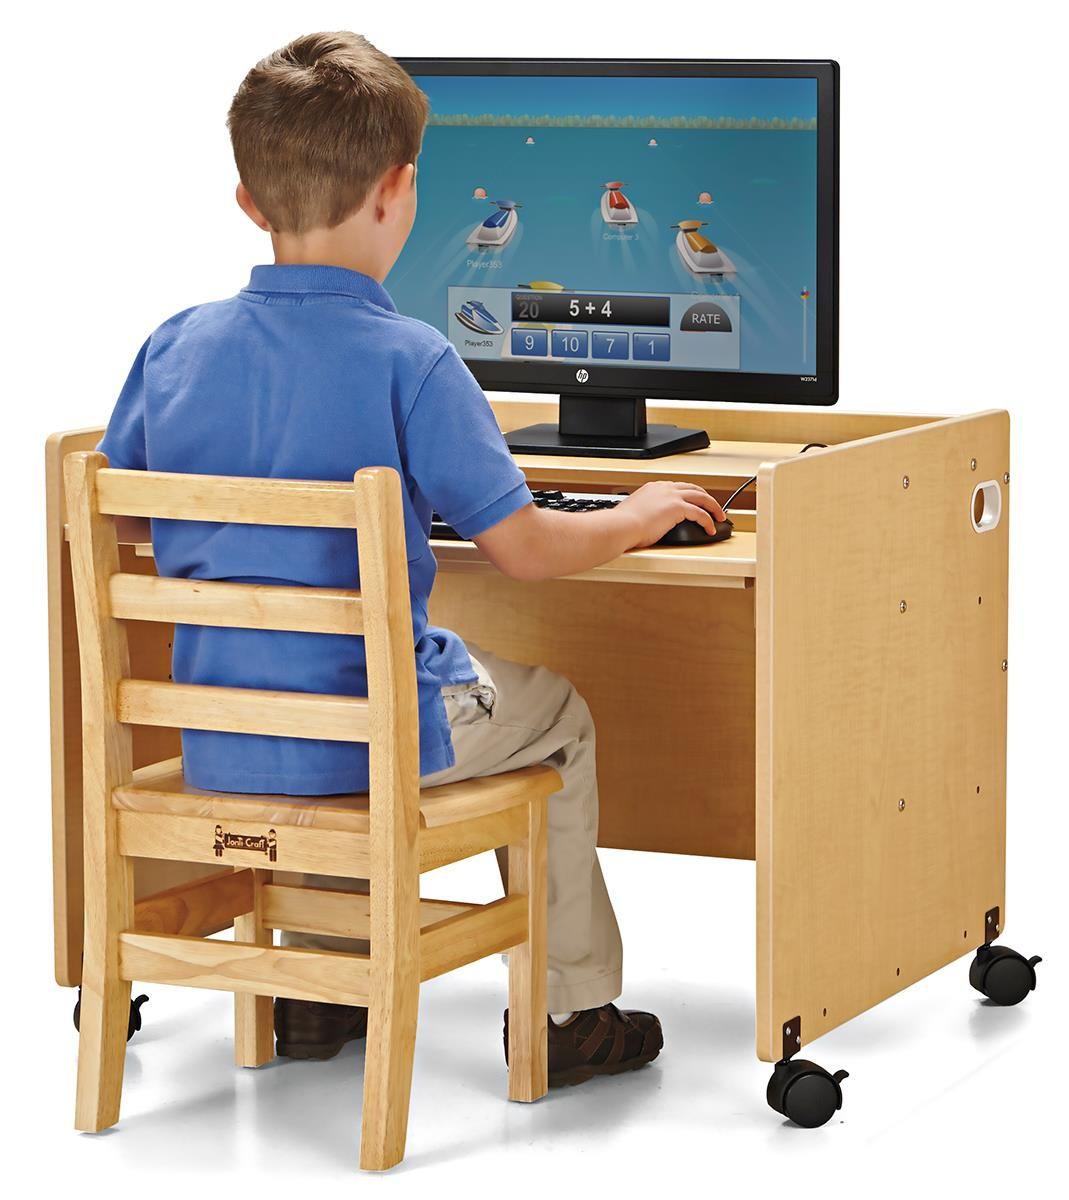 Single Children S Desk W Wheels Jonti Craft Height Adjustable Shelf Natural Adjustable Shelving Kids Computer Single Child